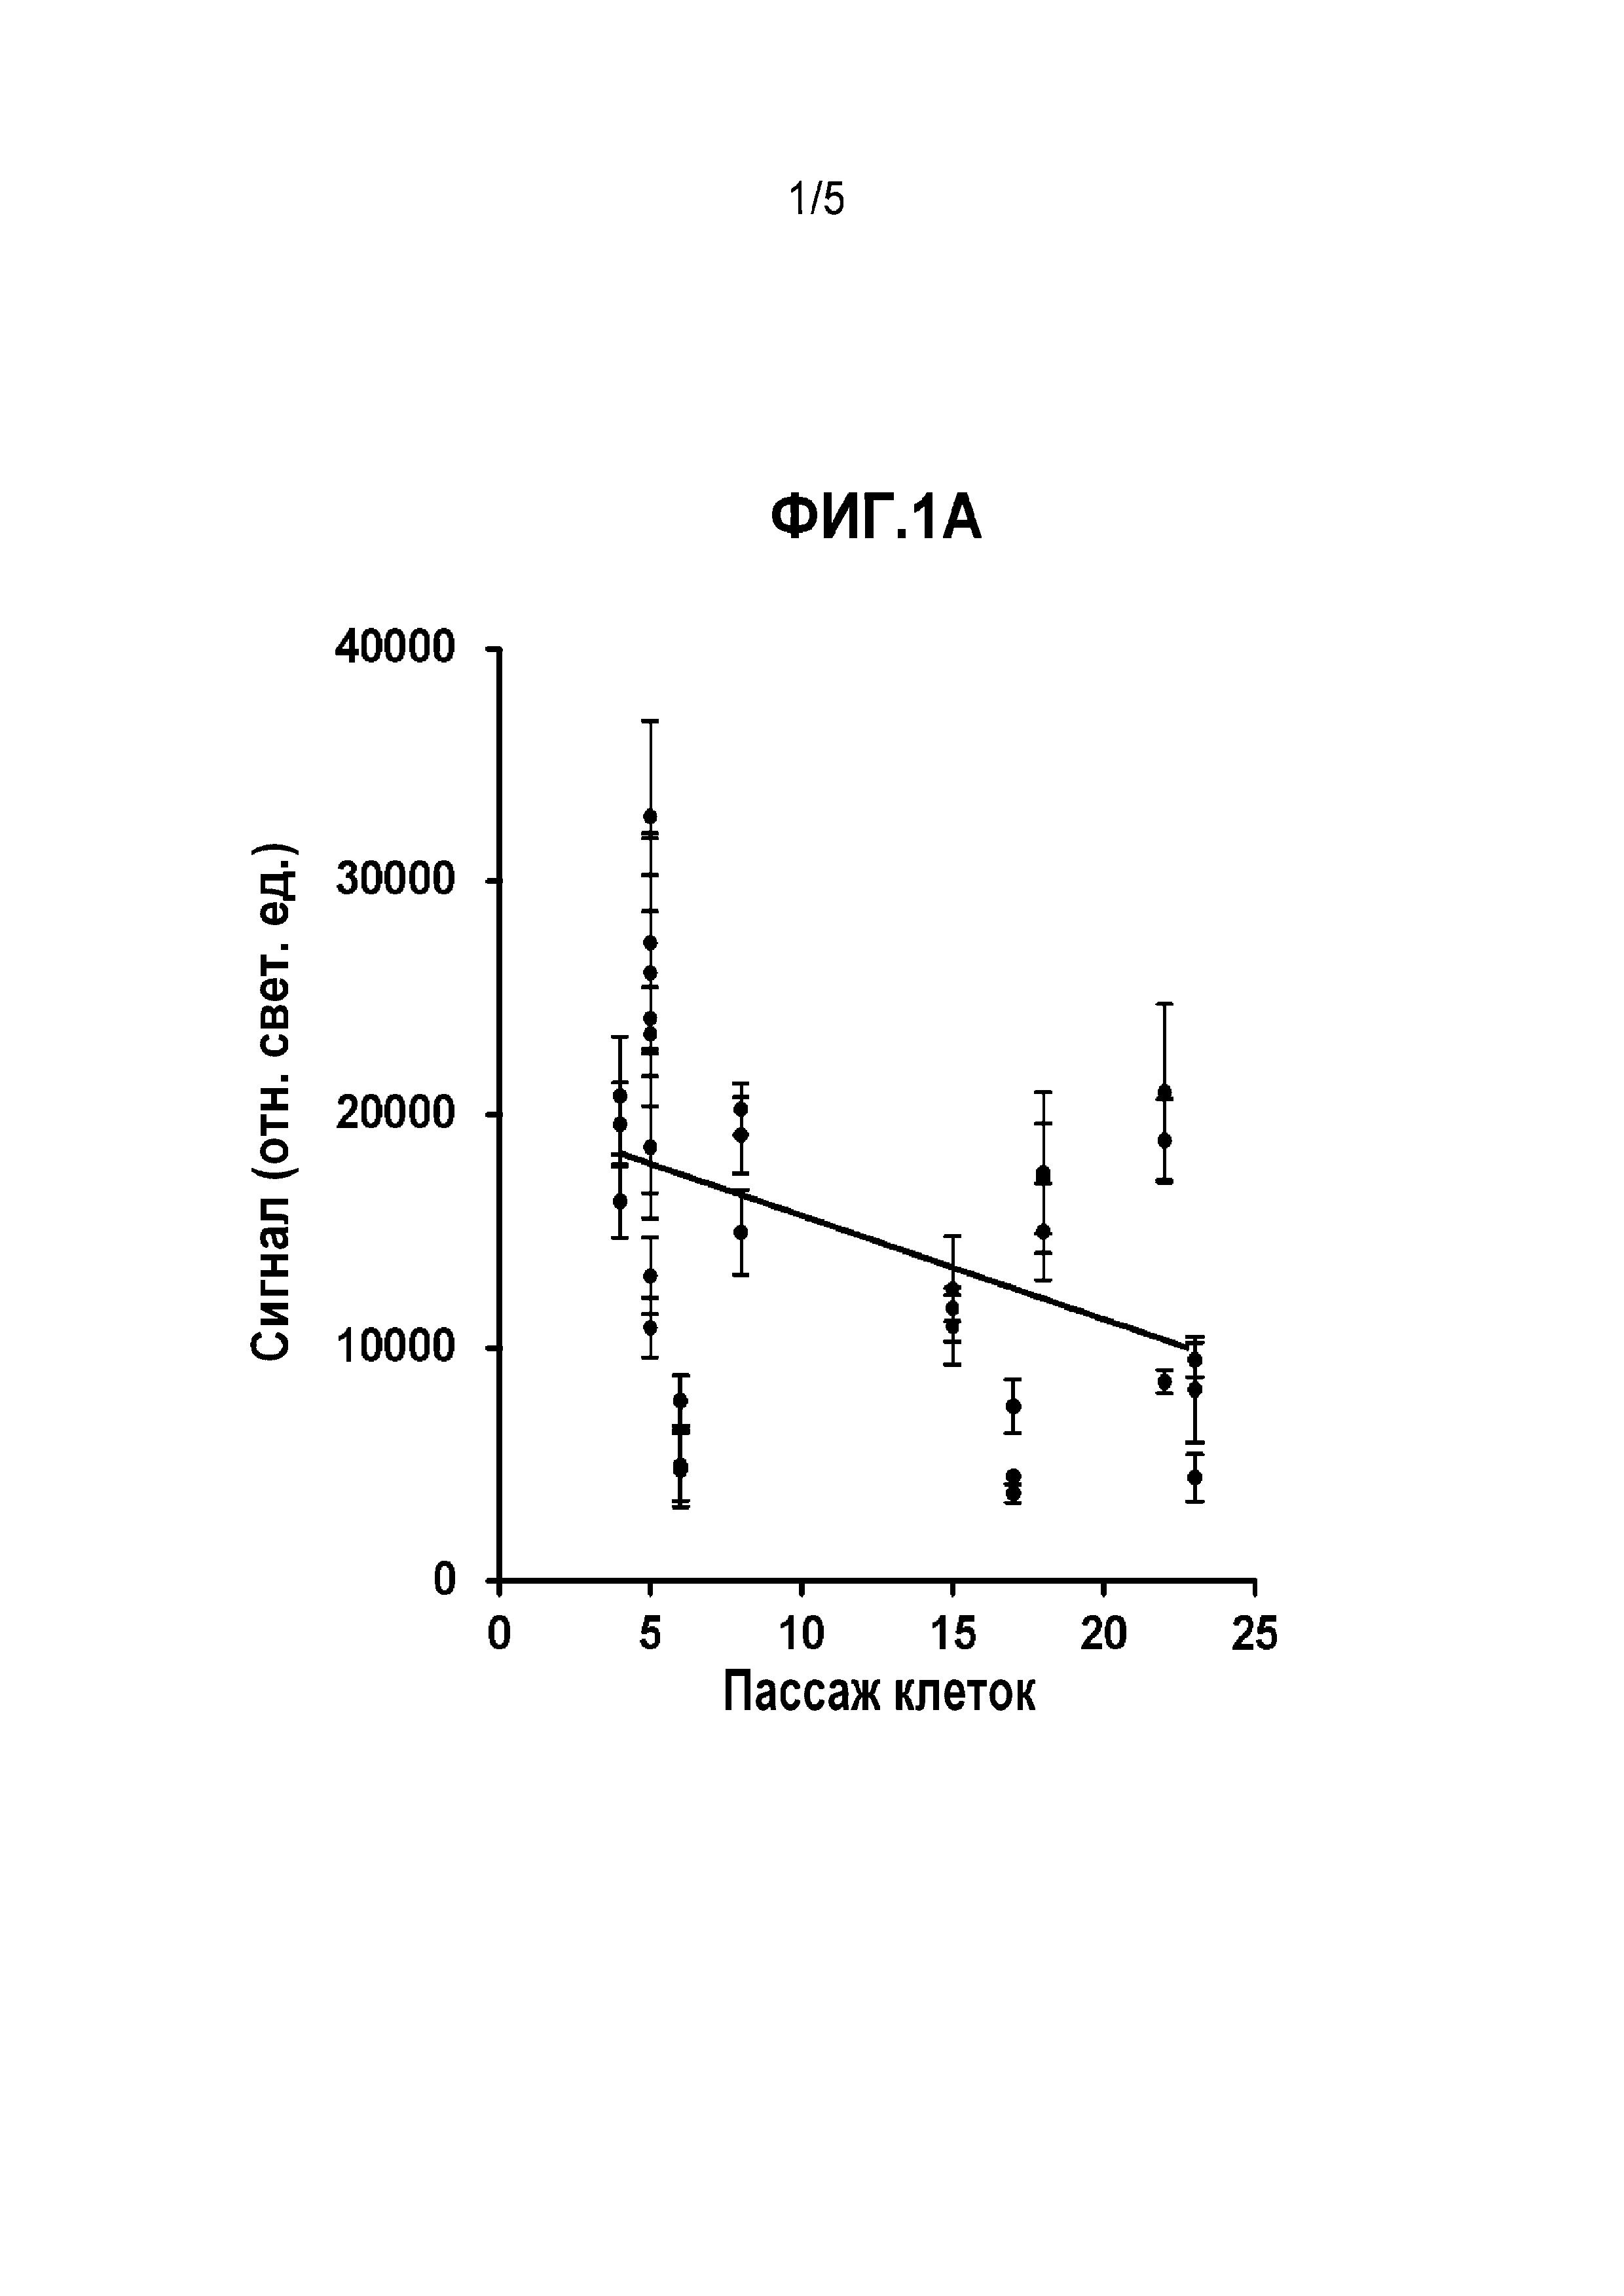 Вектор aav и анализ на нейтрализующие антитела против aav (аденоассоциированного вируса)